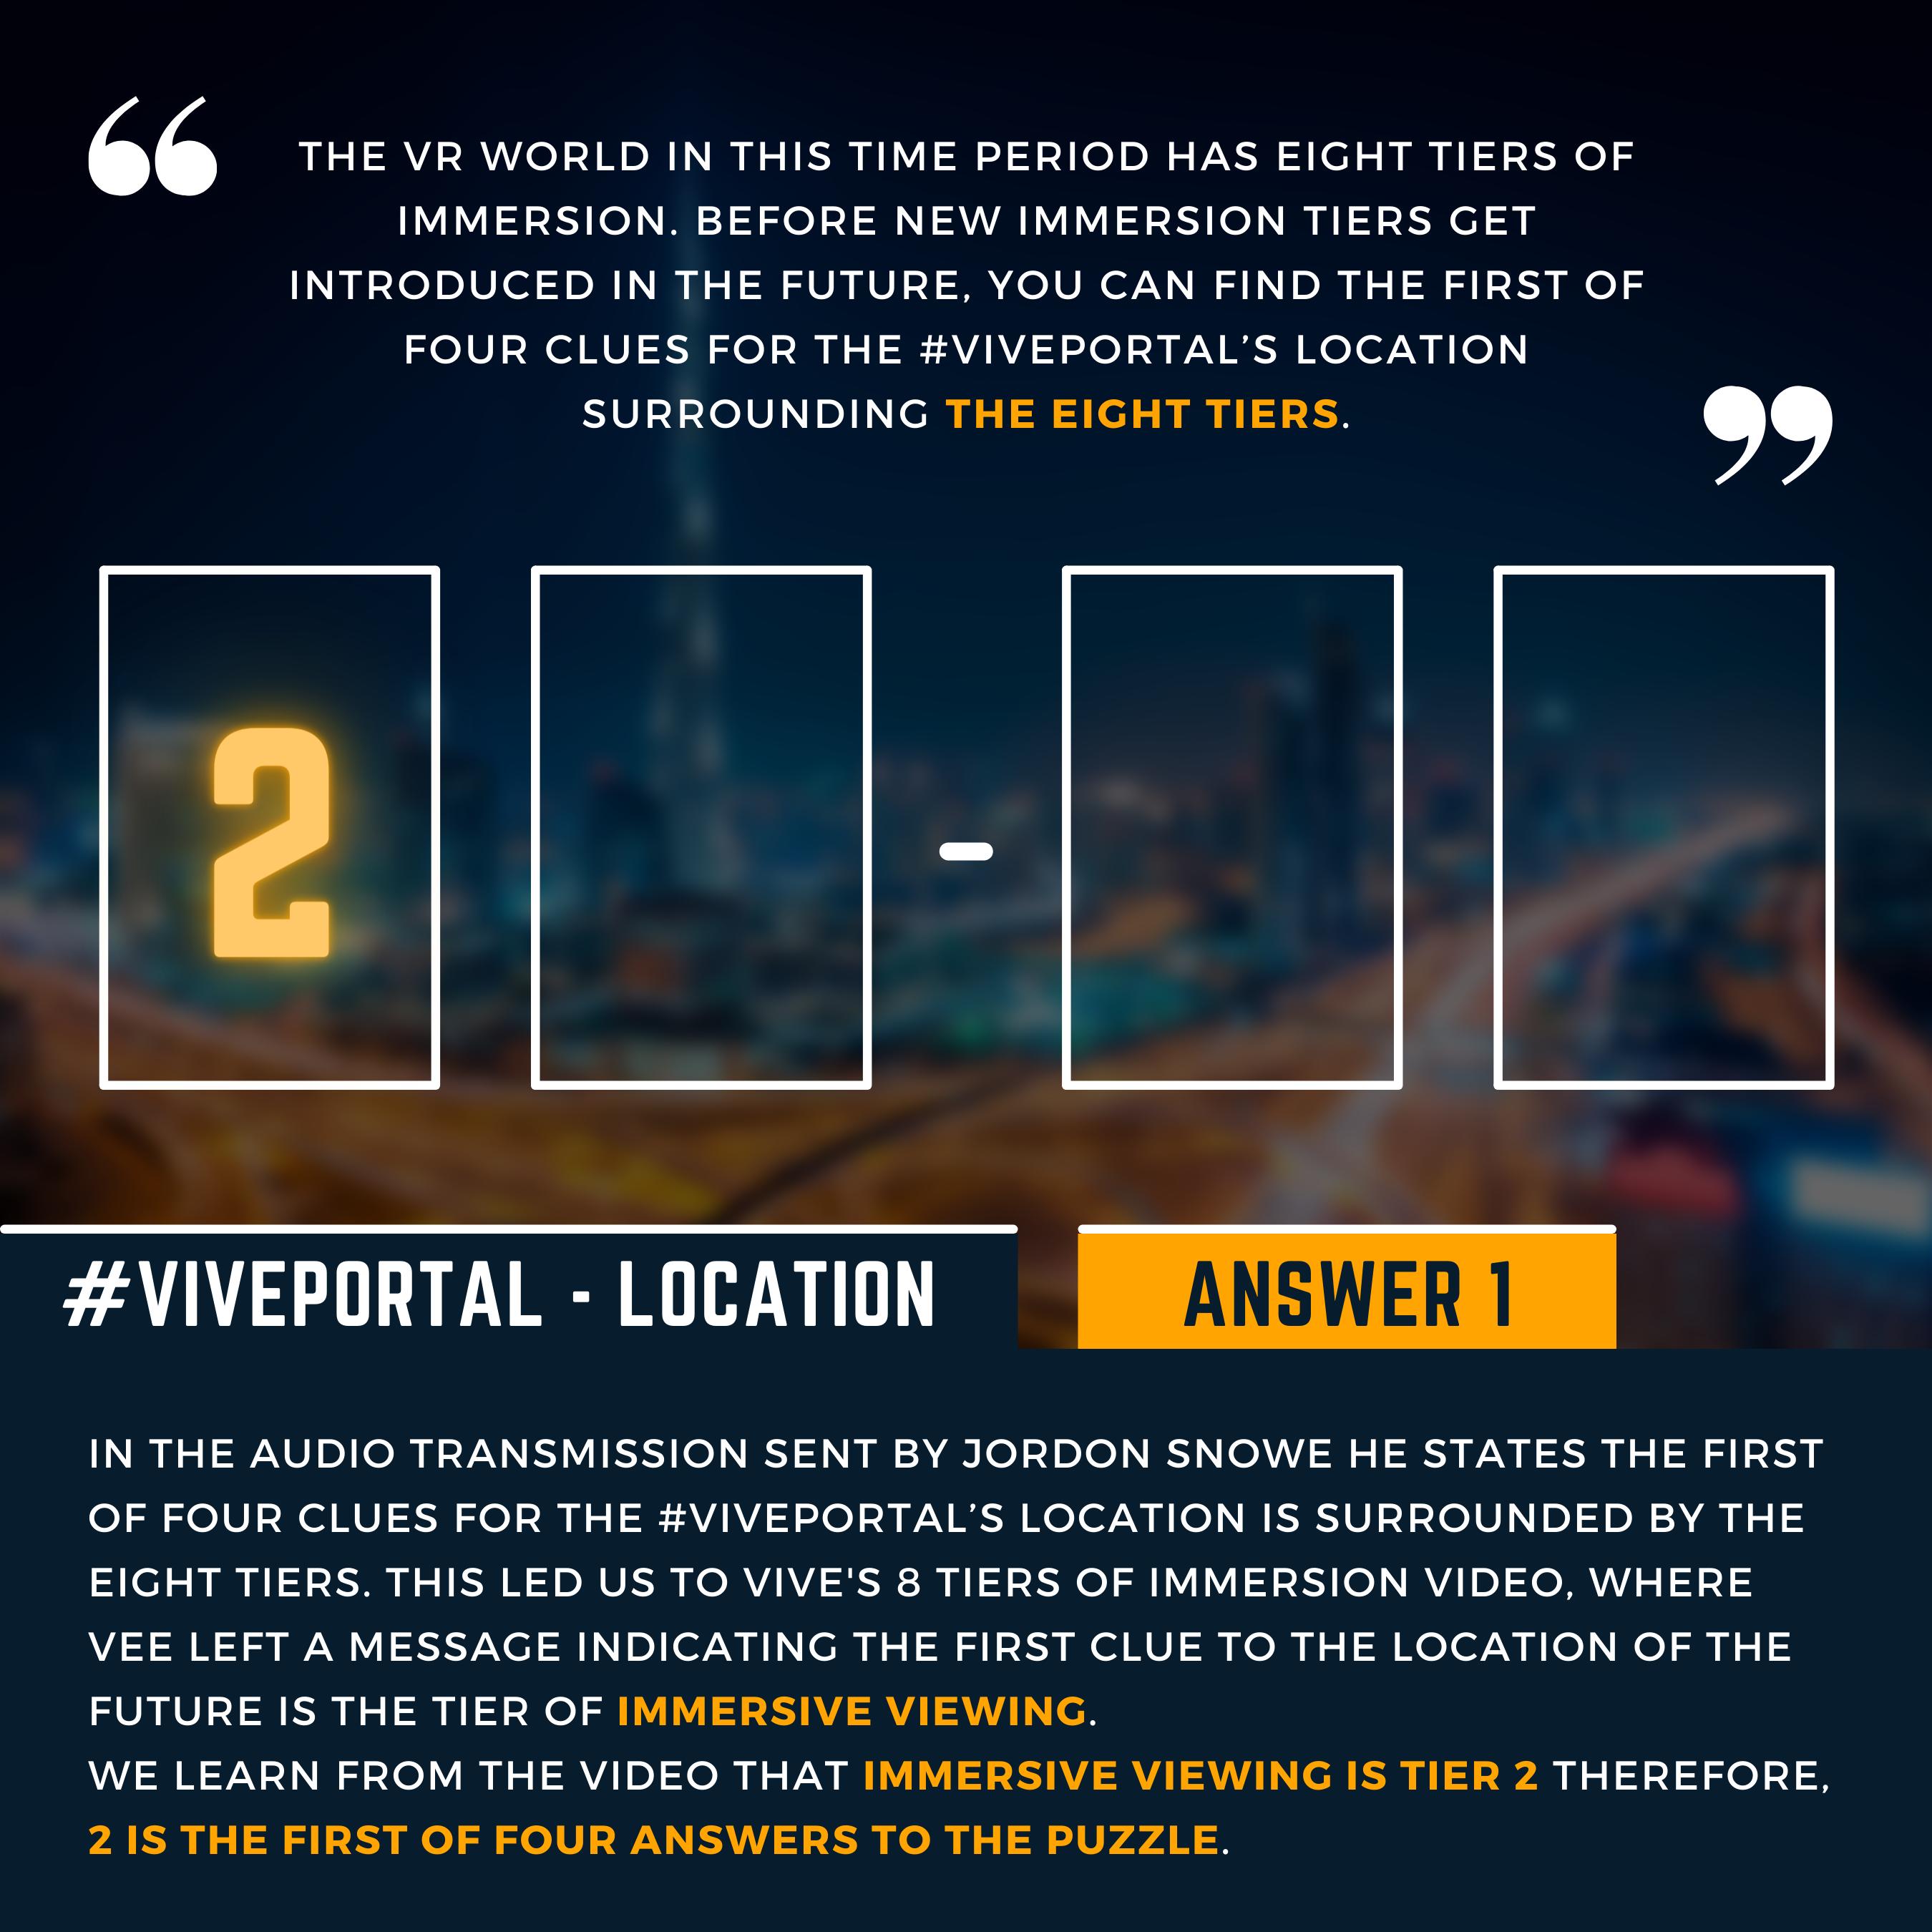 #VIVEPORTAL ARG